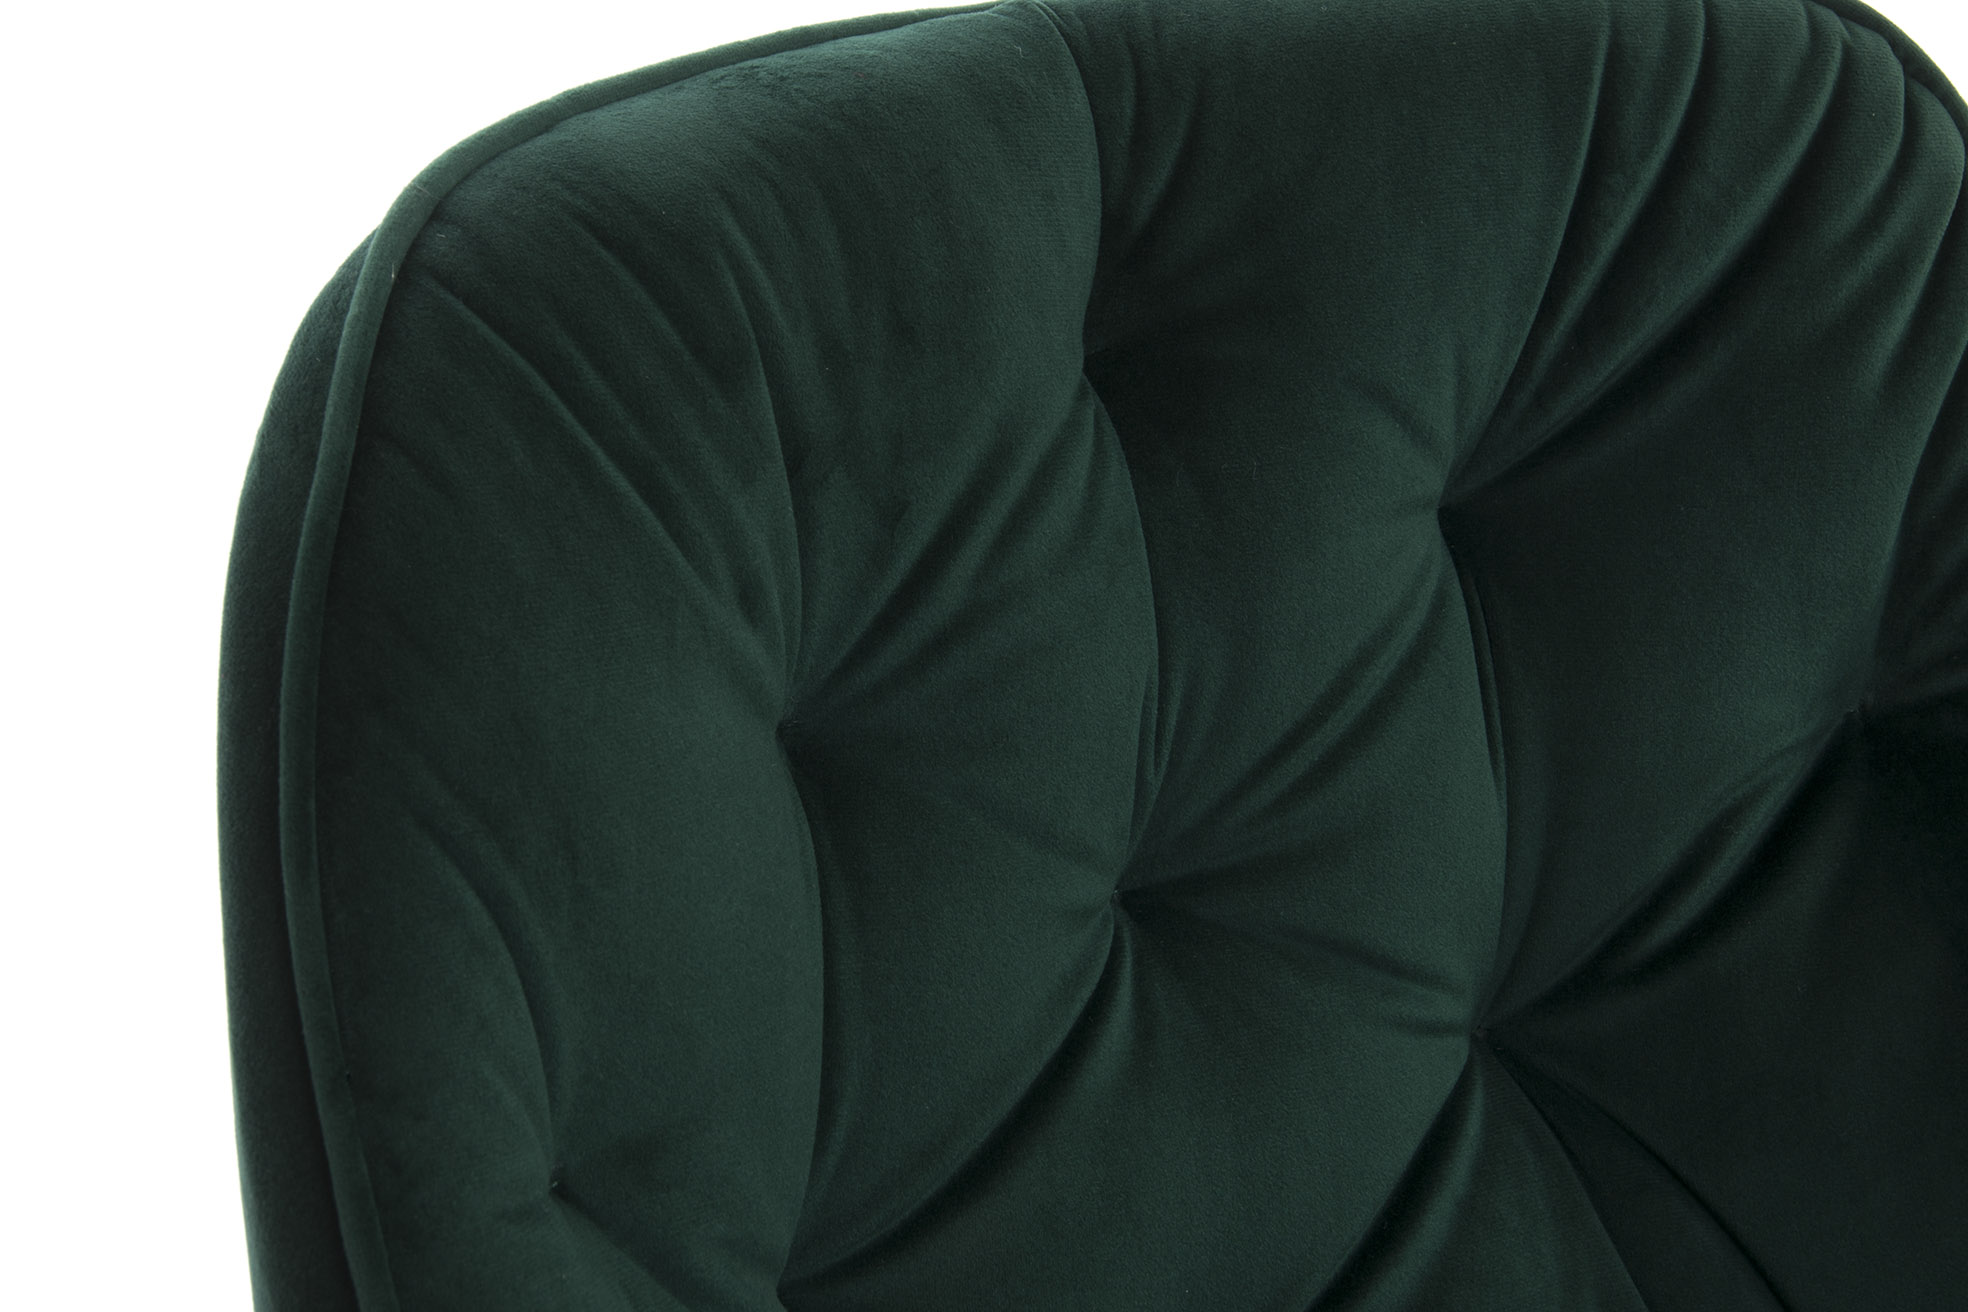 Chaise velours métal 56x62x78